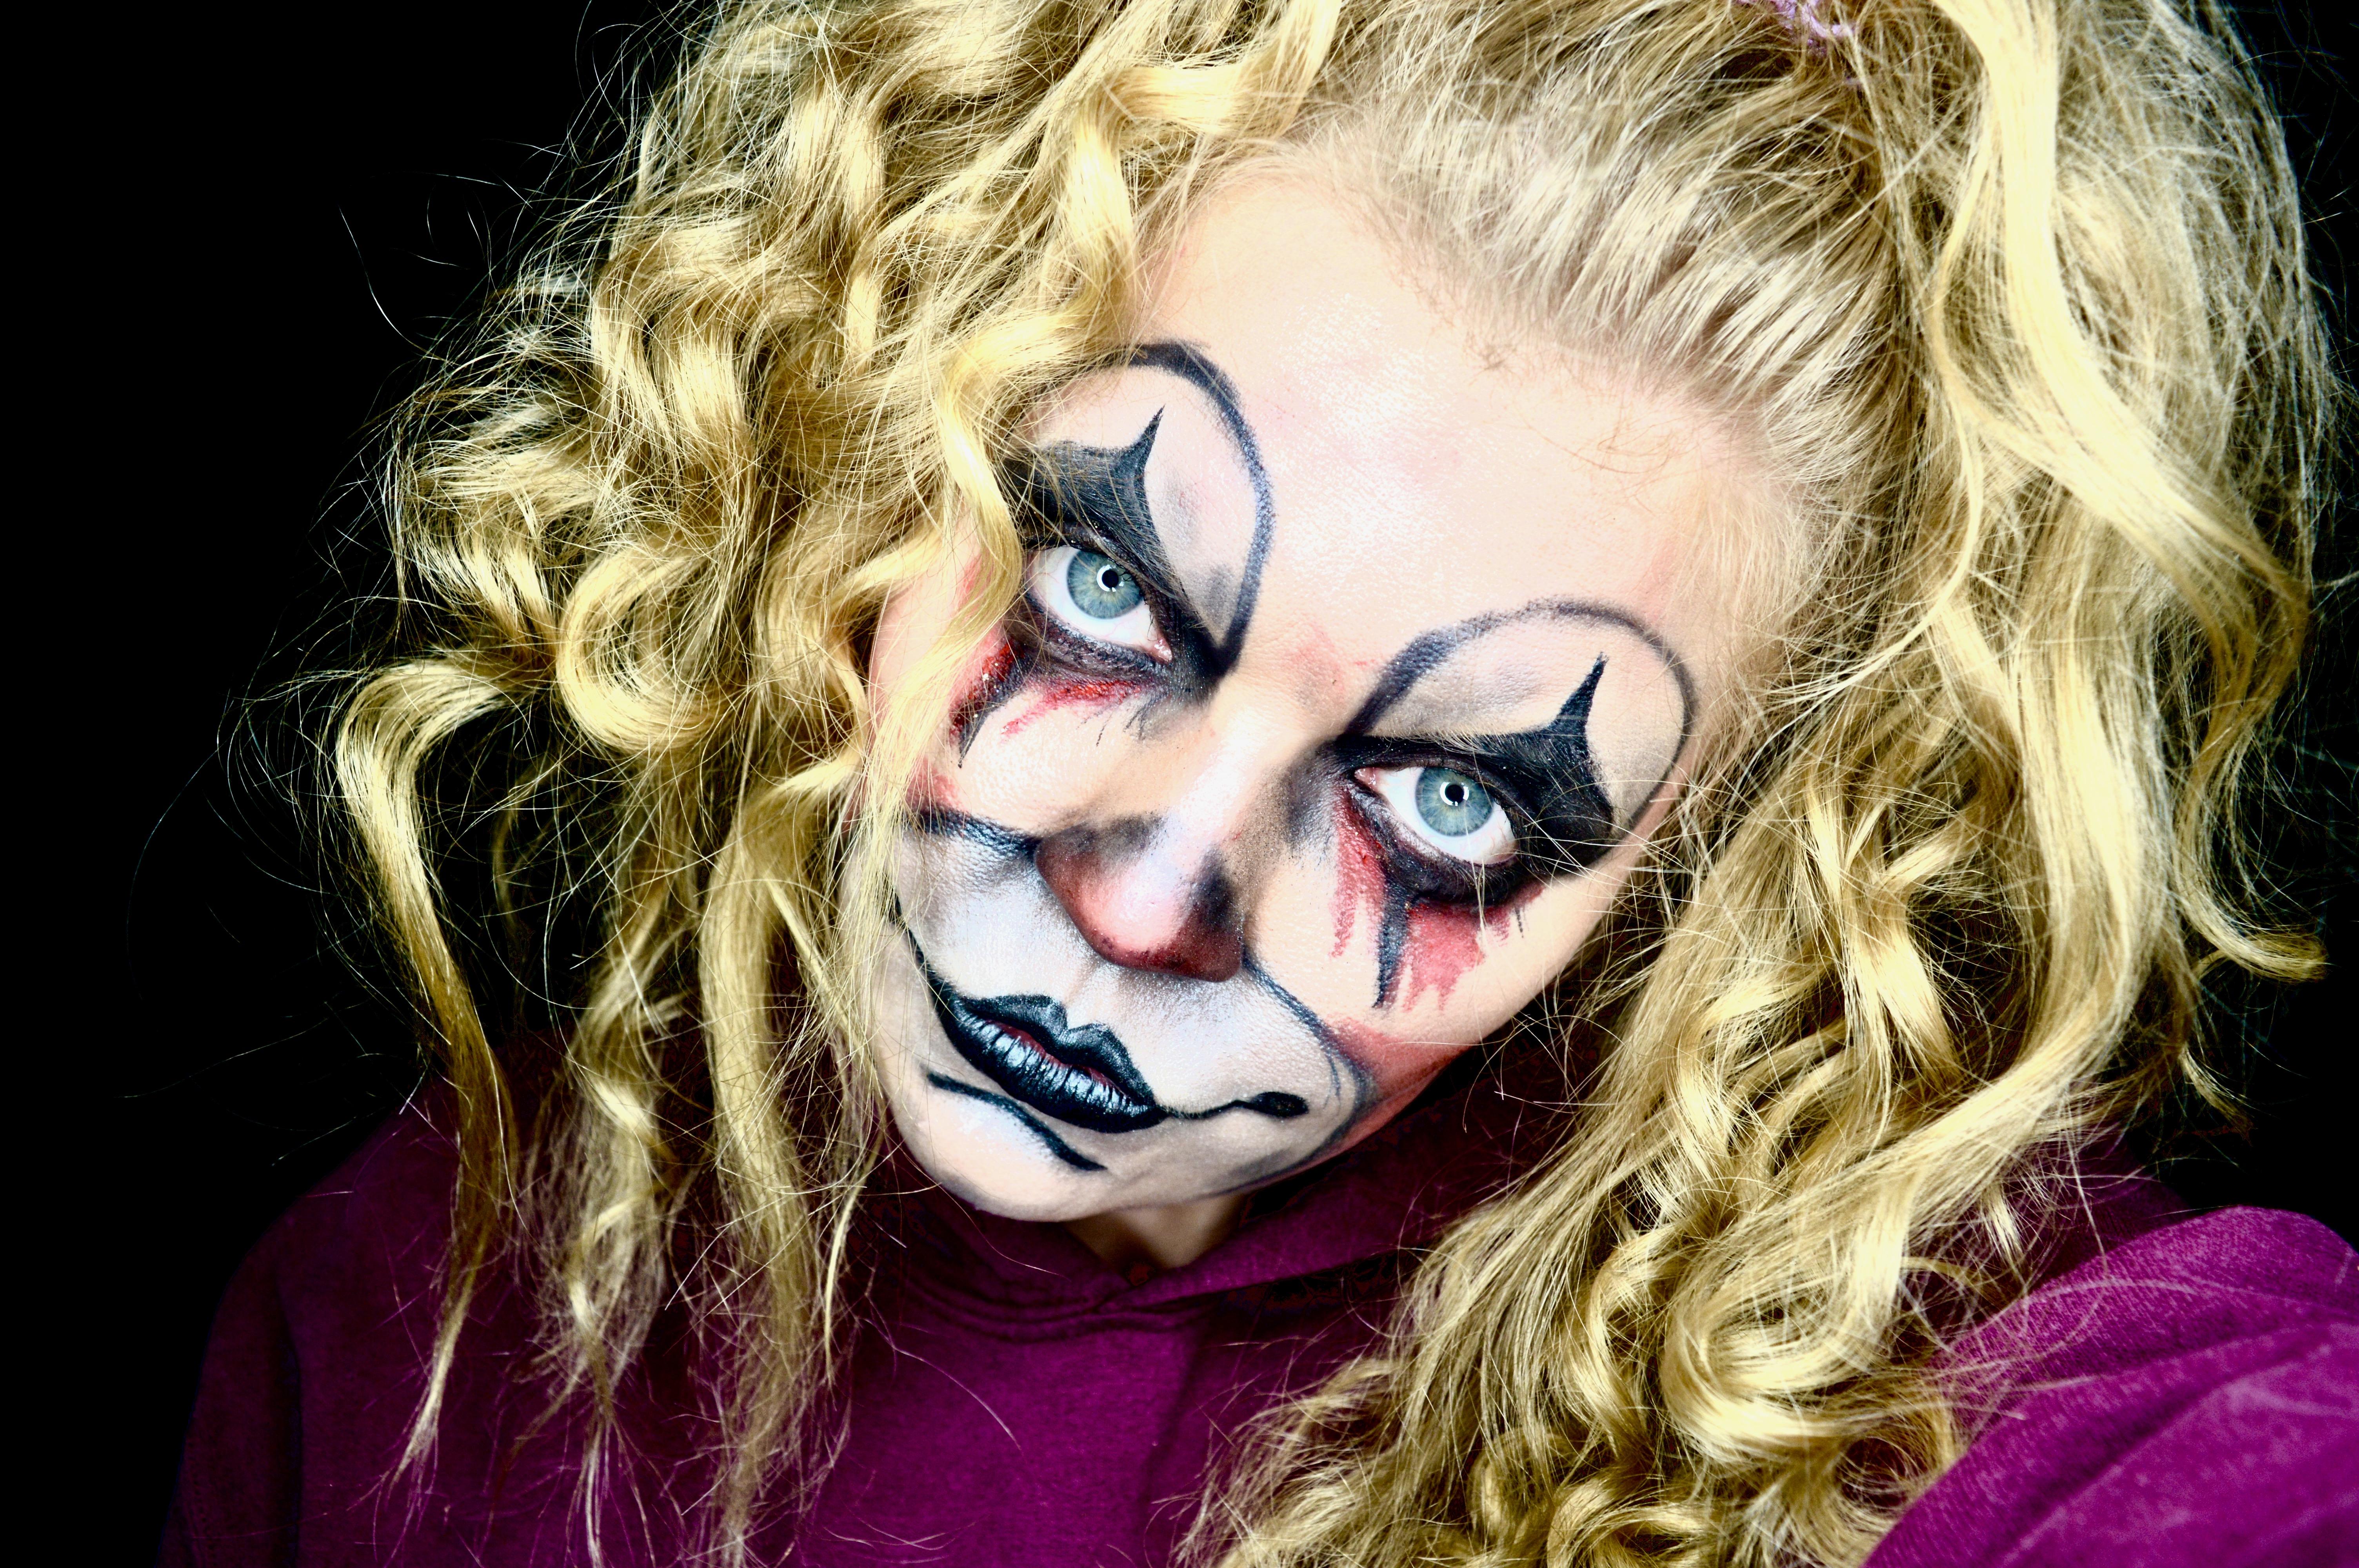 Scary Halloween Makeup ideas | Dead Blonde Clown | Elle Blonde Luxury Lifestyle Destination Blog